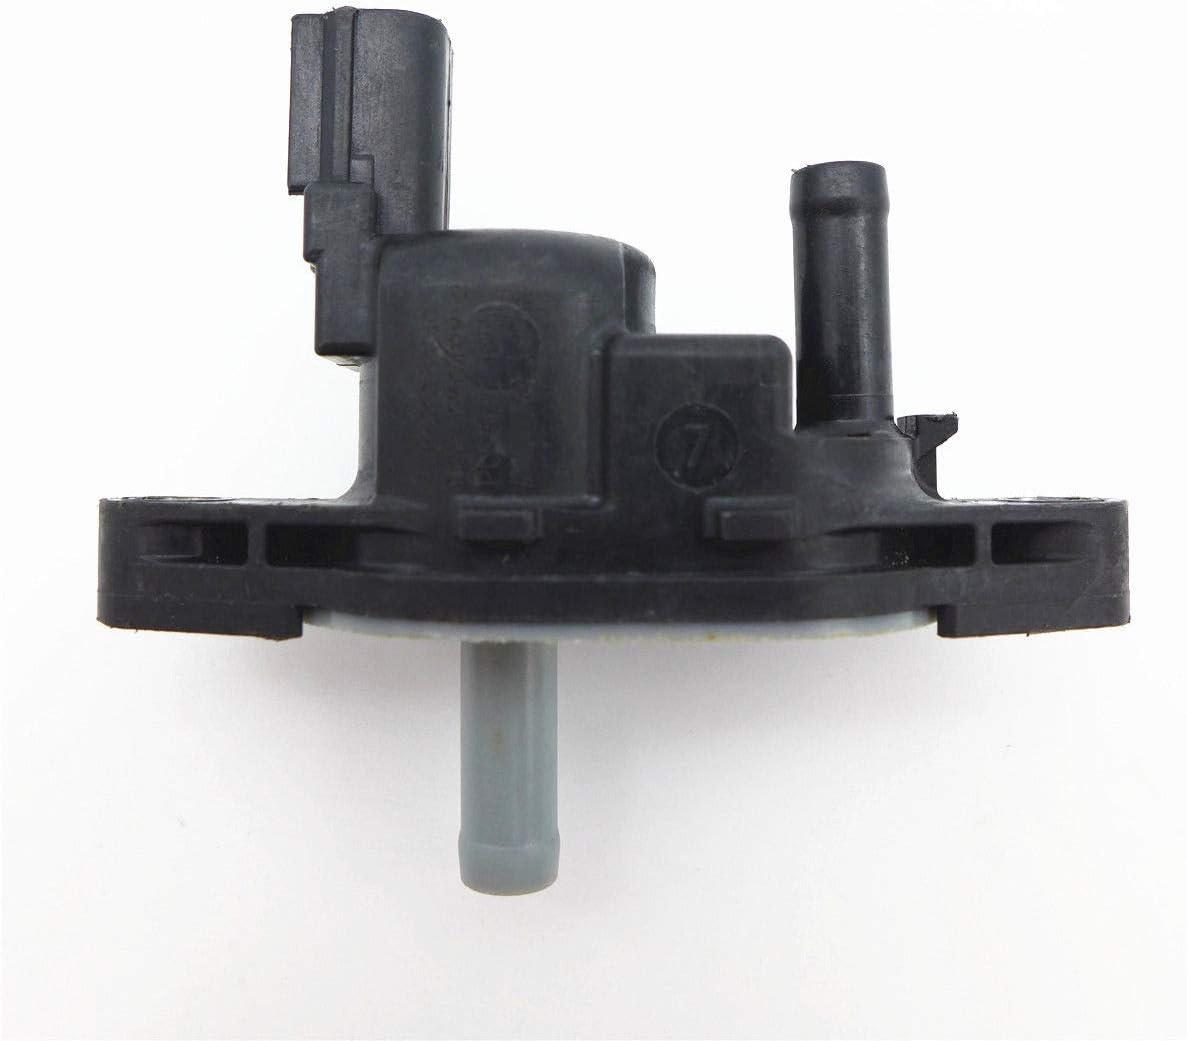 Bosting Vapor Canister Solenoid Valve Purge for Acura Honda Odyssey 36162-RMX-A01